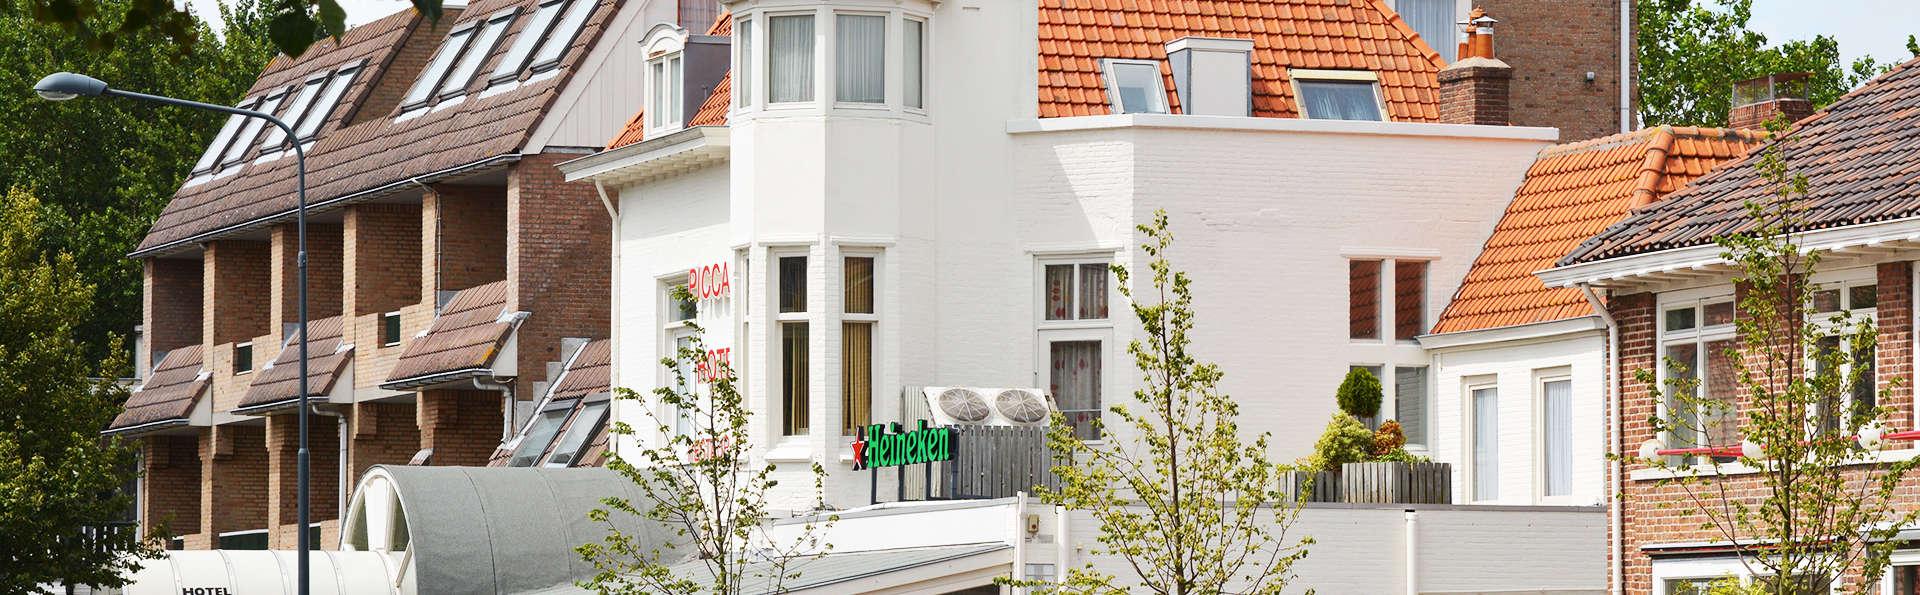 Hotel Restaurant Piccard - edit_exterior.jpg